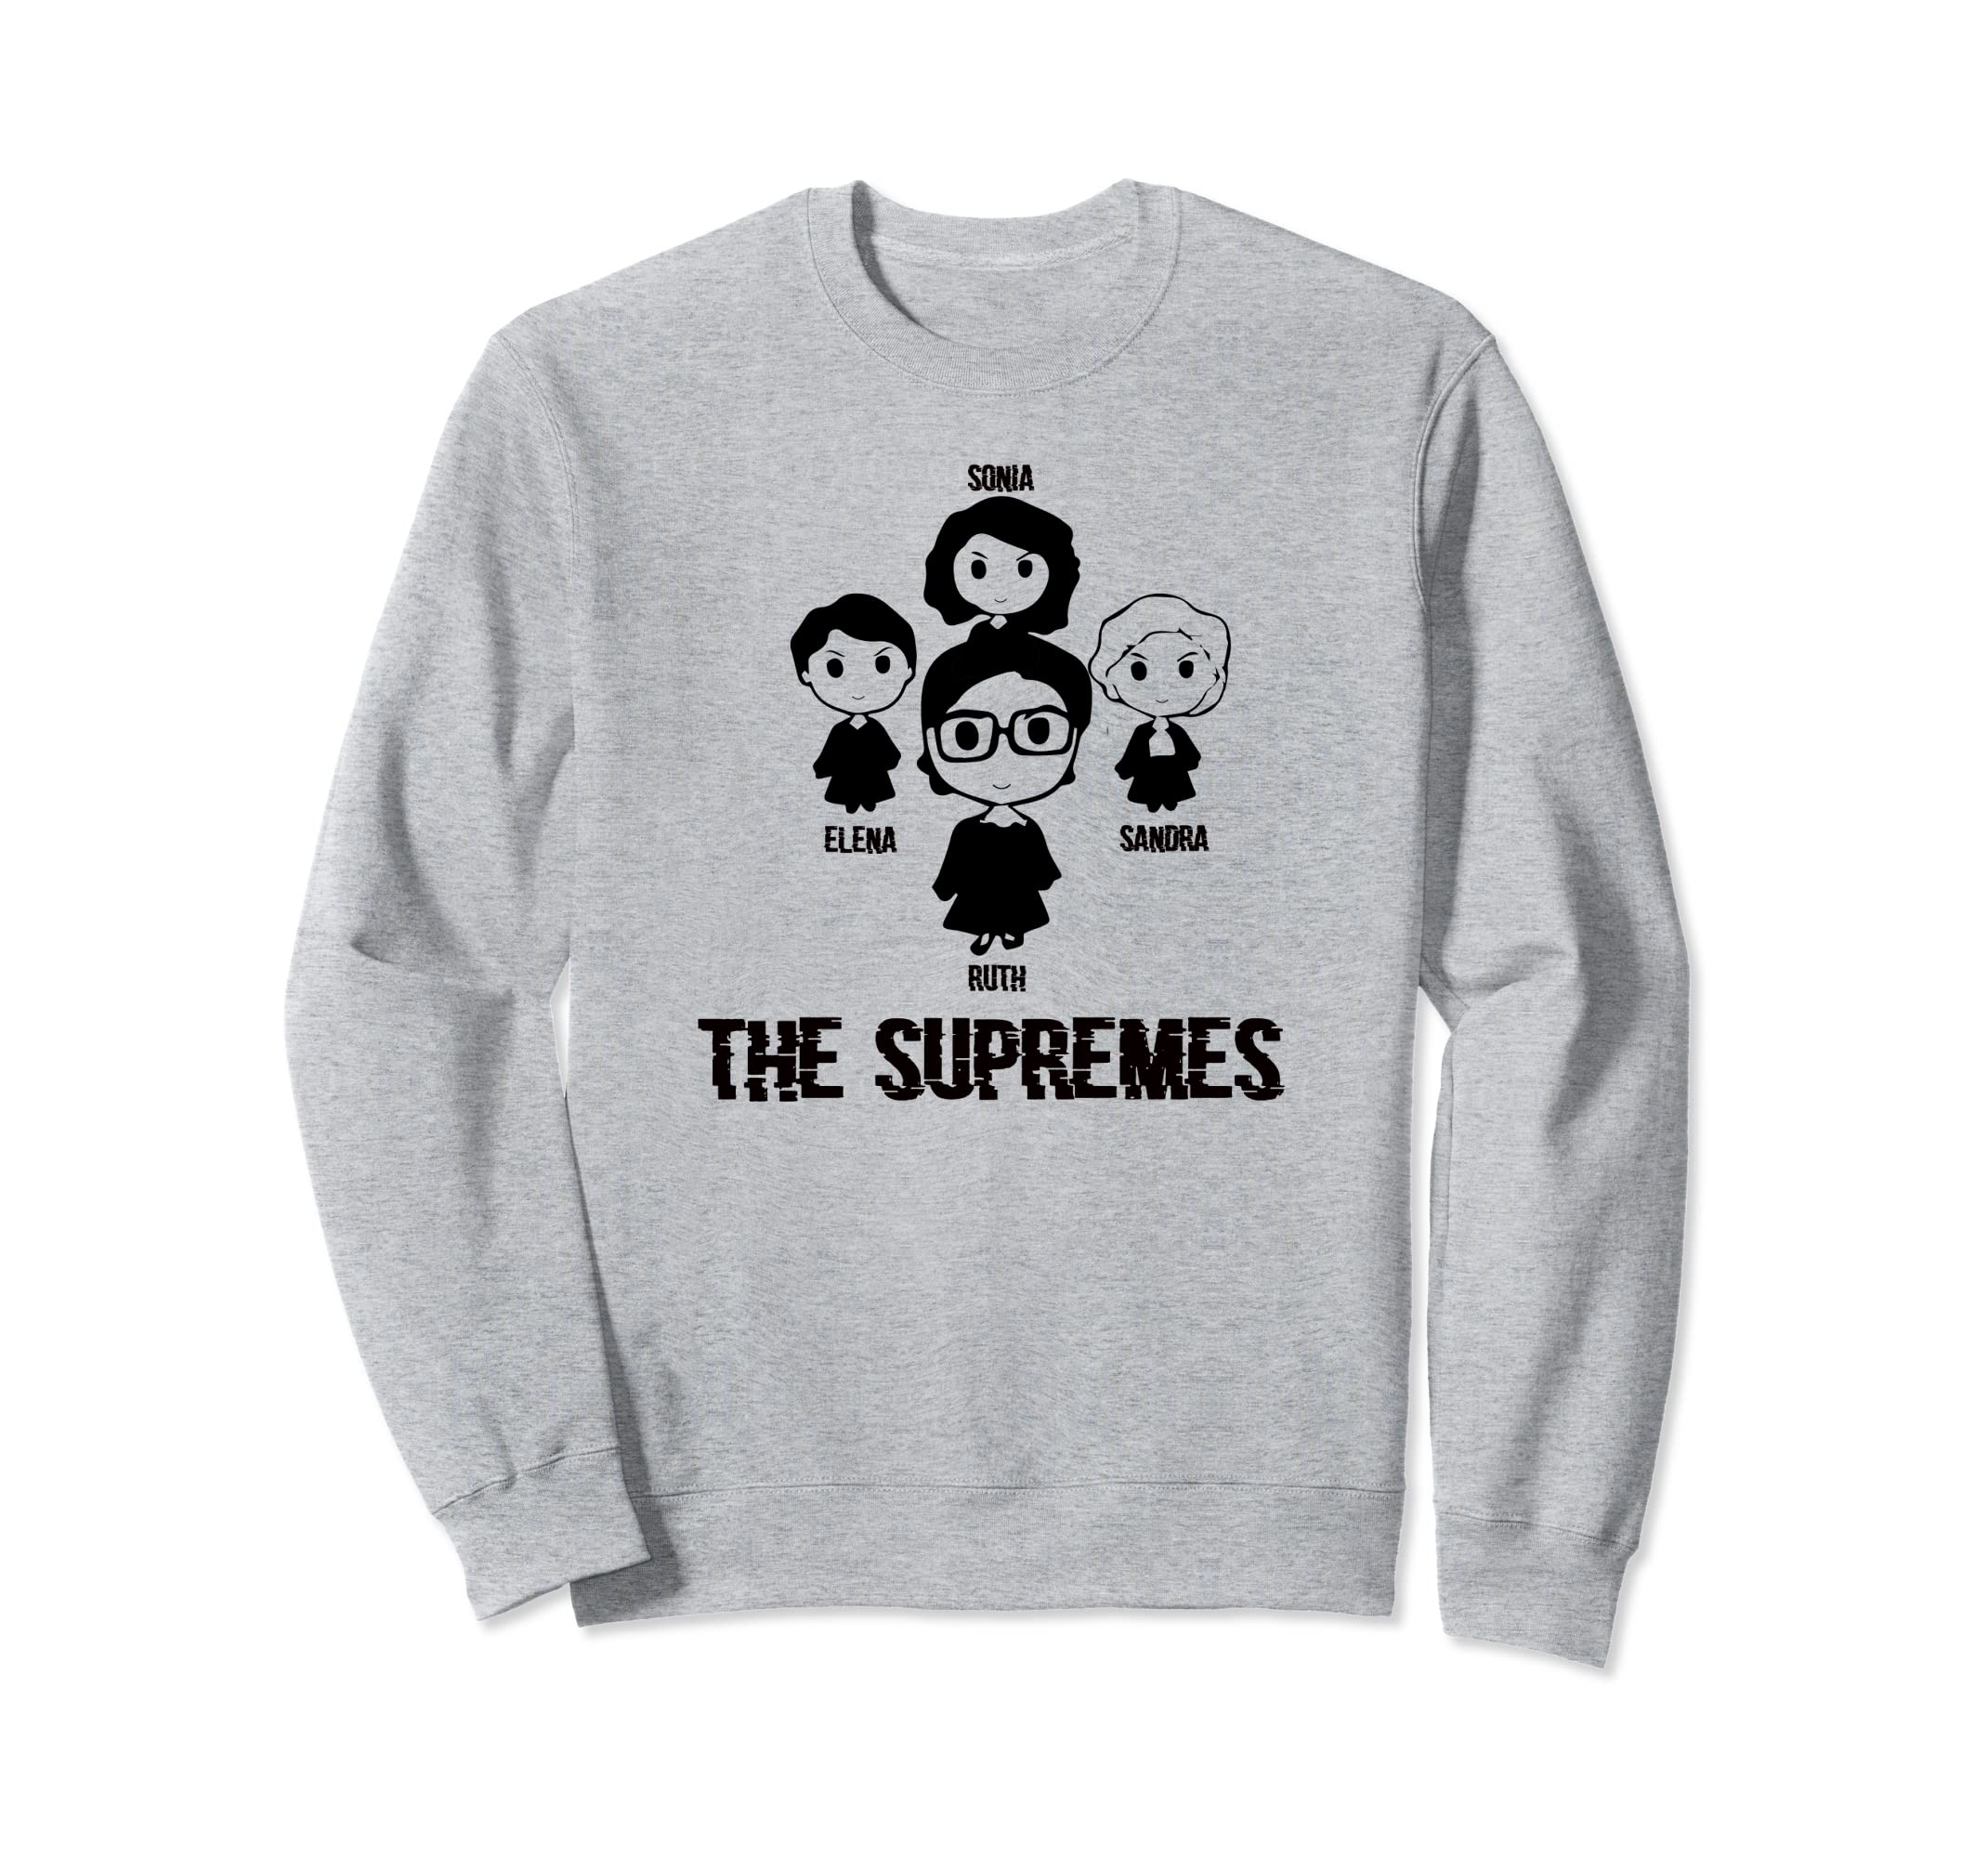 4a7fd3e1ddda Amazon.com: THE SUPREMES Supreme Court Justices RBG cute sweatshirt:  Clothing